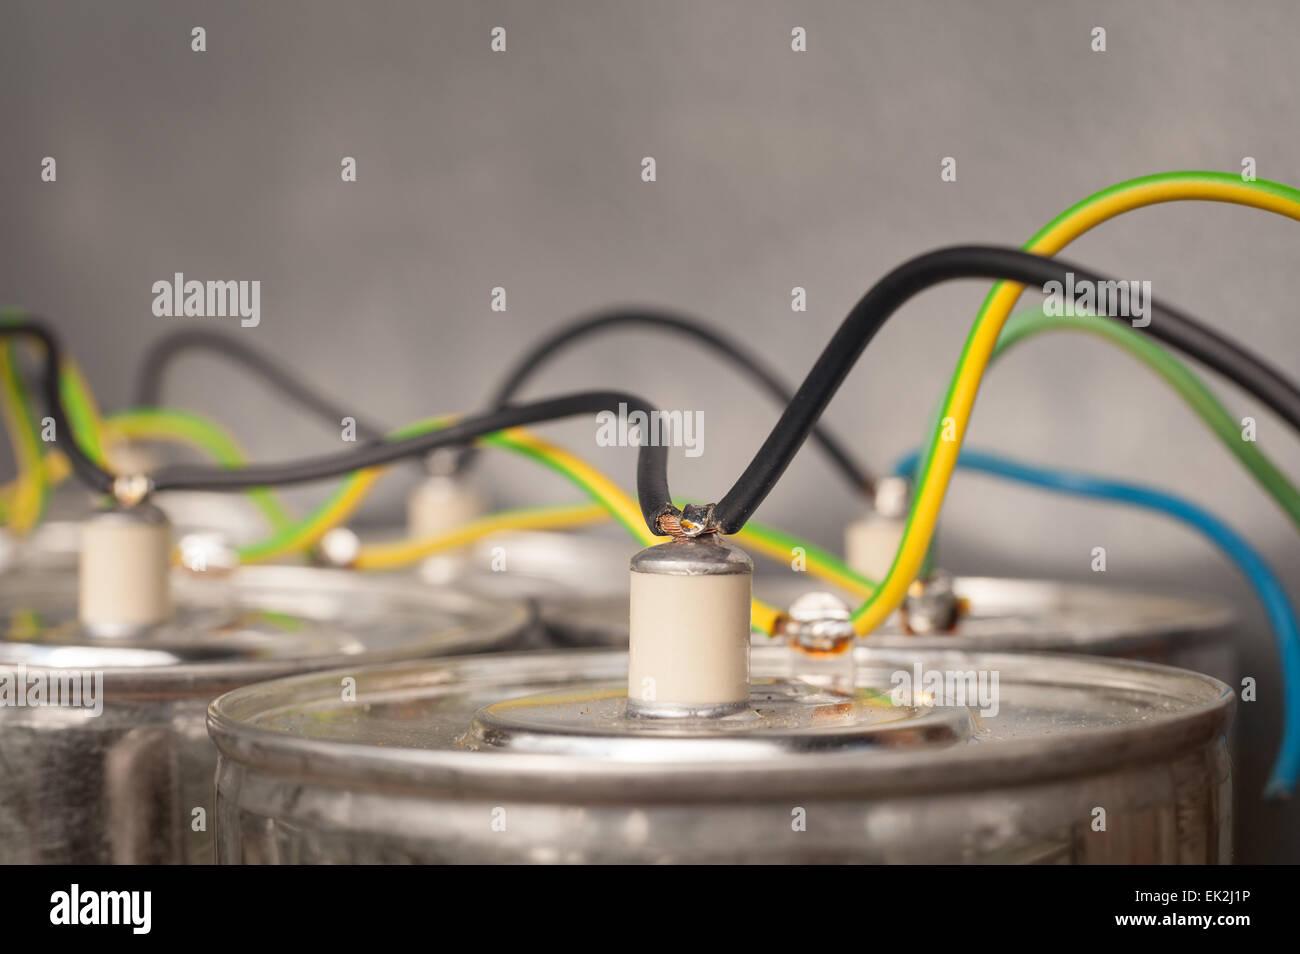 Ziemlich Drahtspulen Führen Ideen - Schaltplan Serie Circuit ...